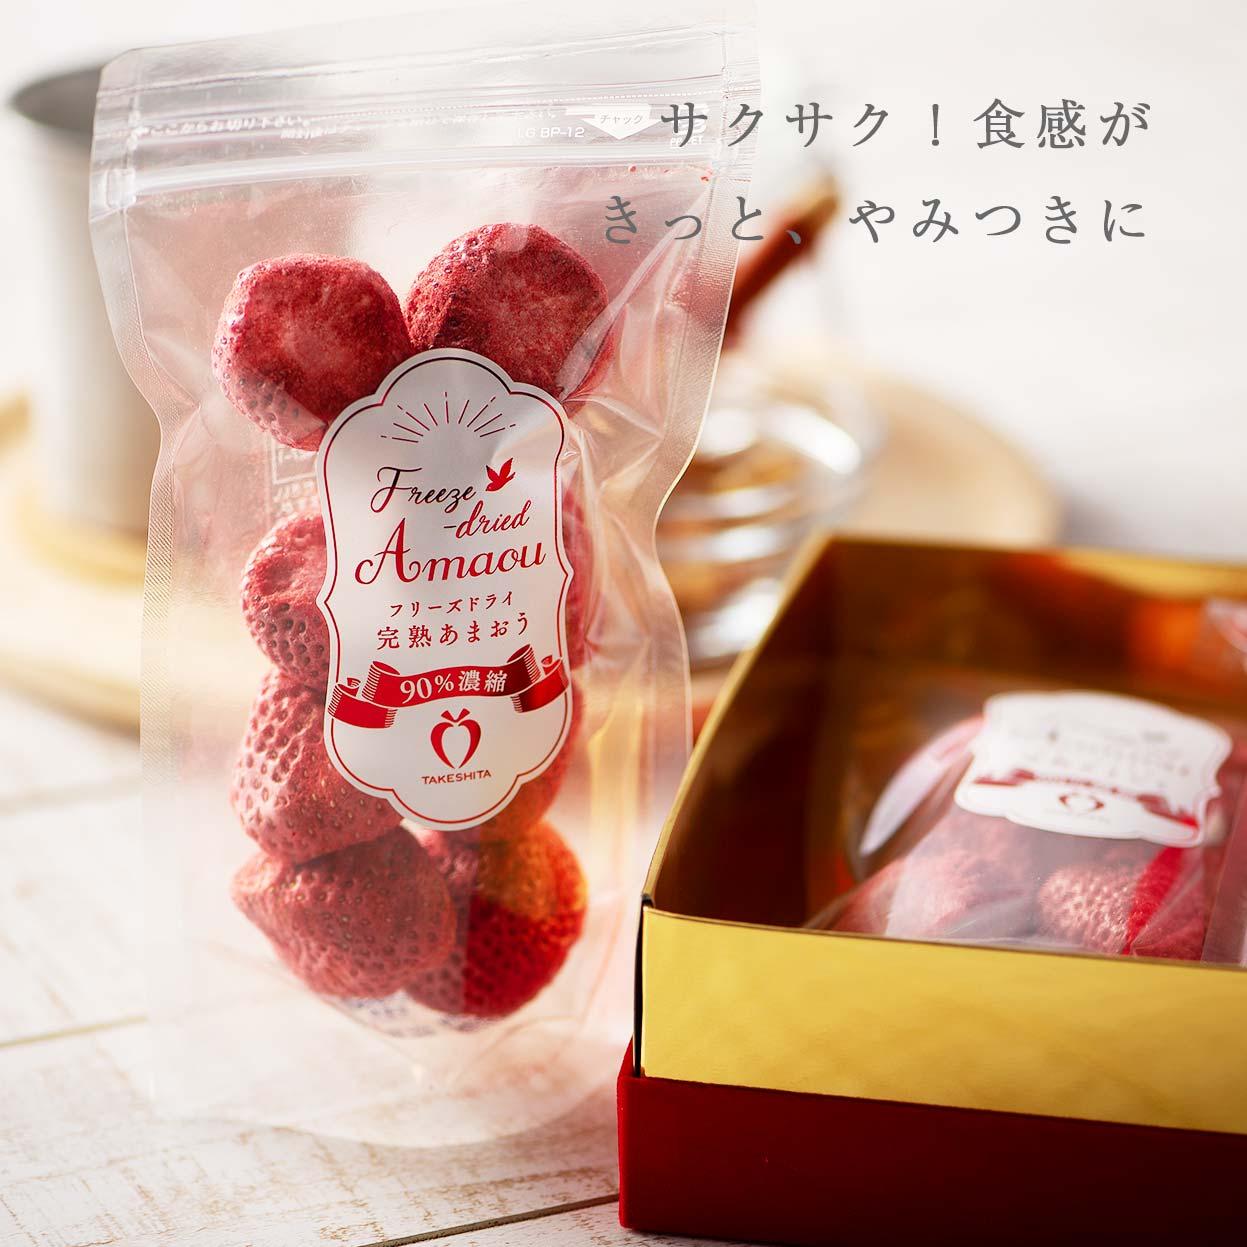 VIPボックス赤 フリーズドライあまおうセット(20g×3袋)